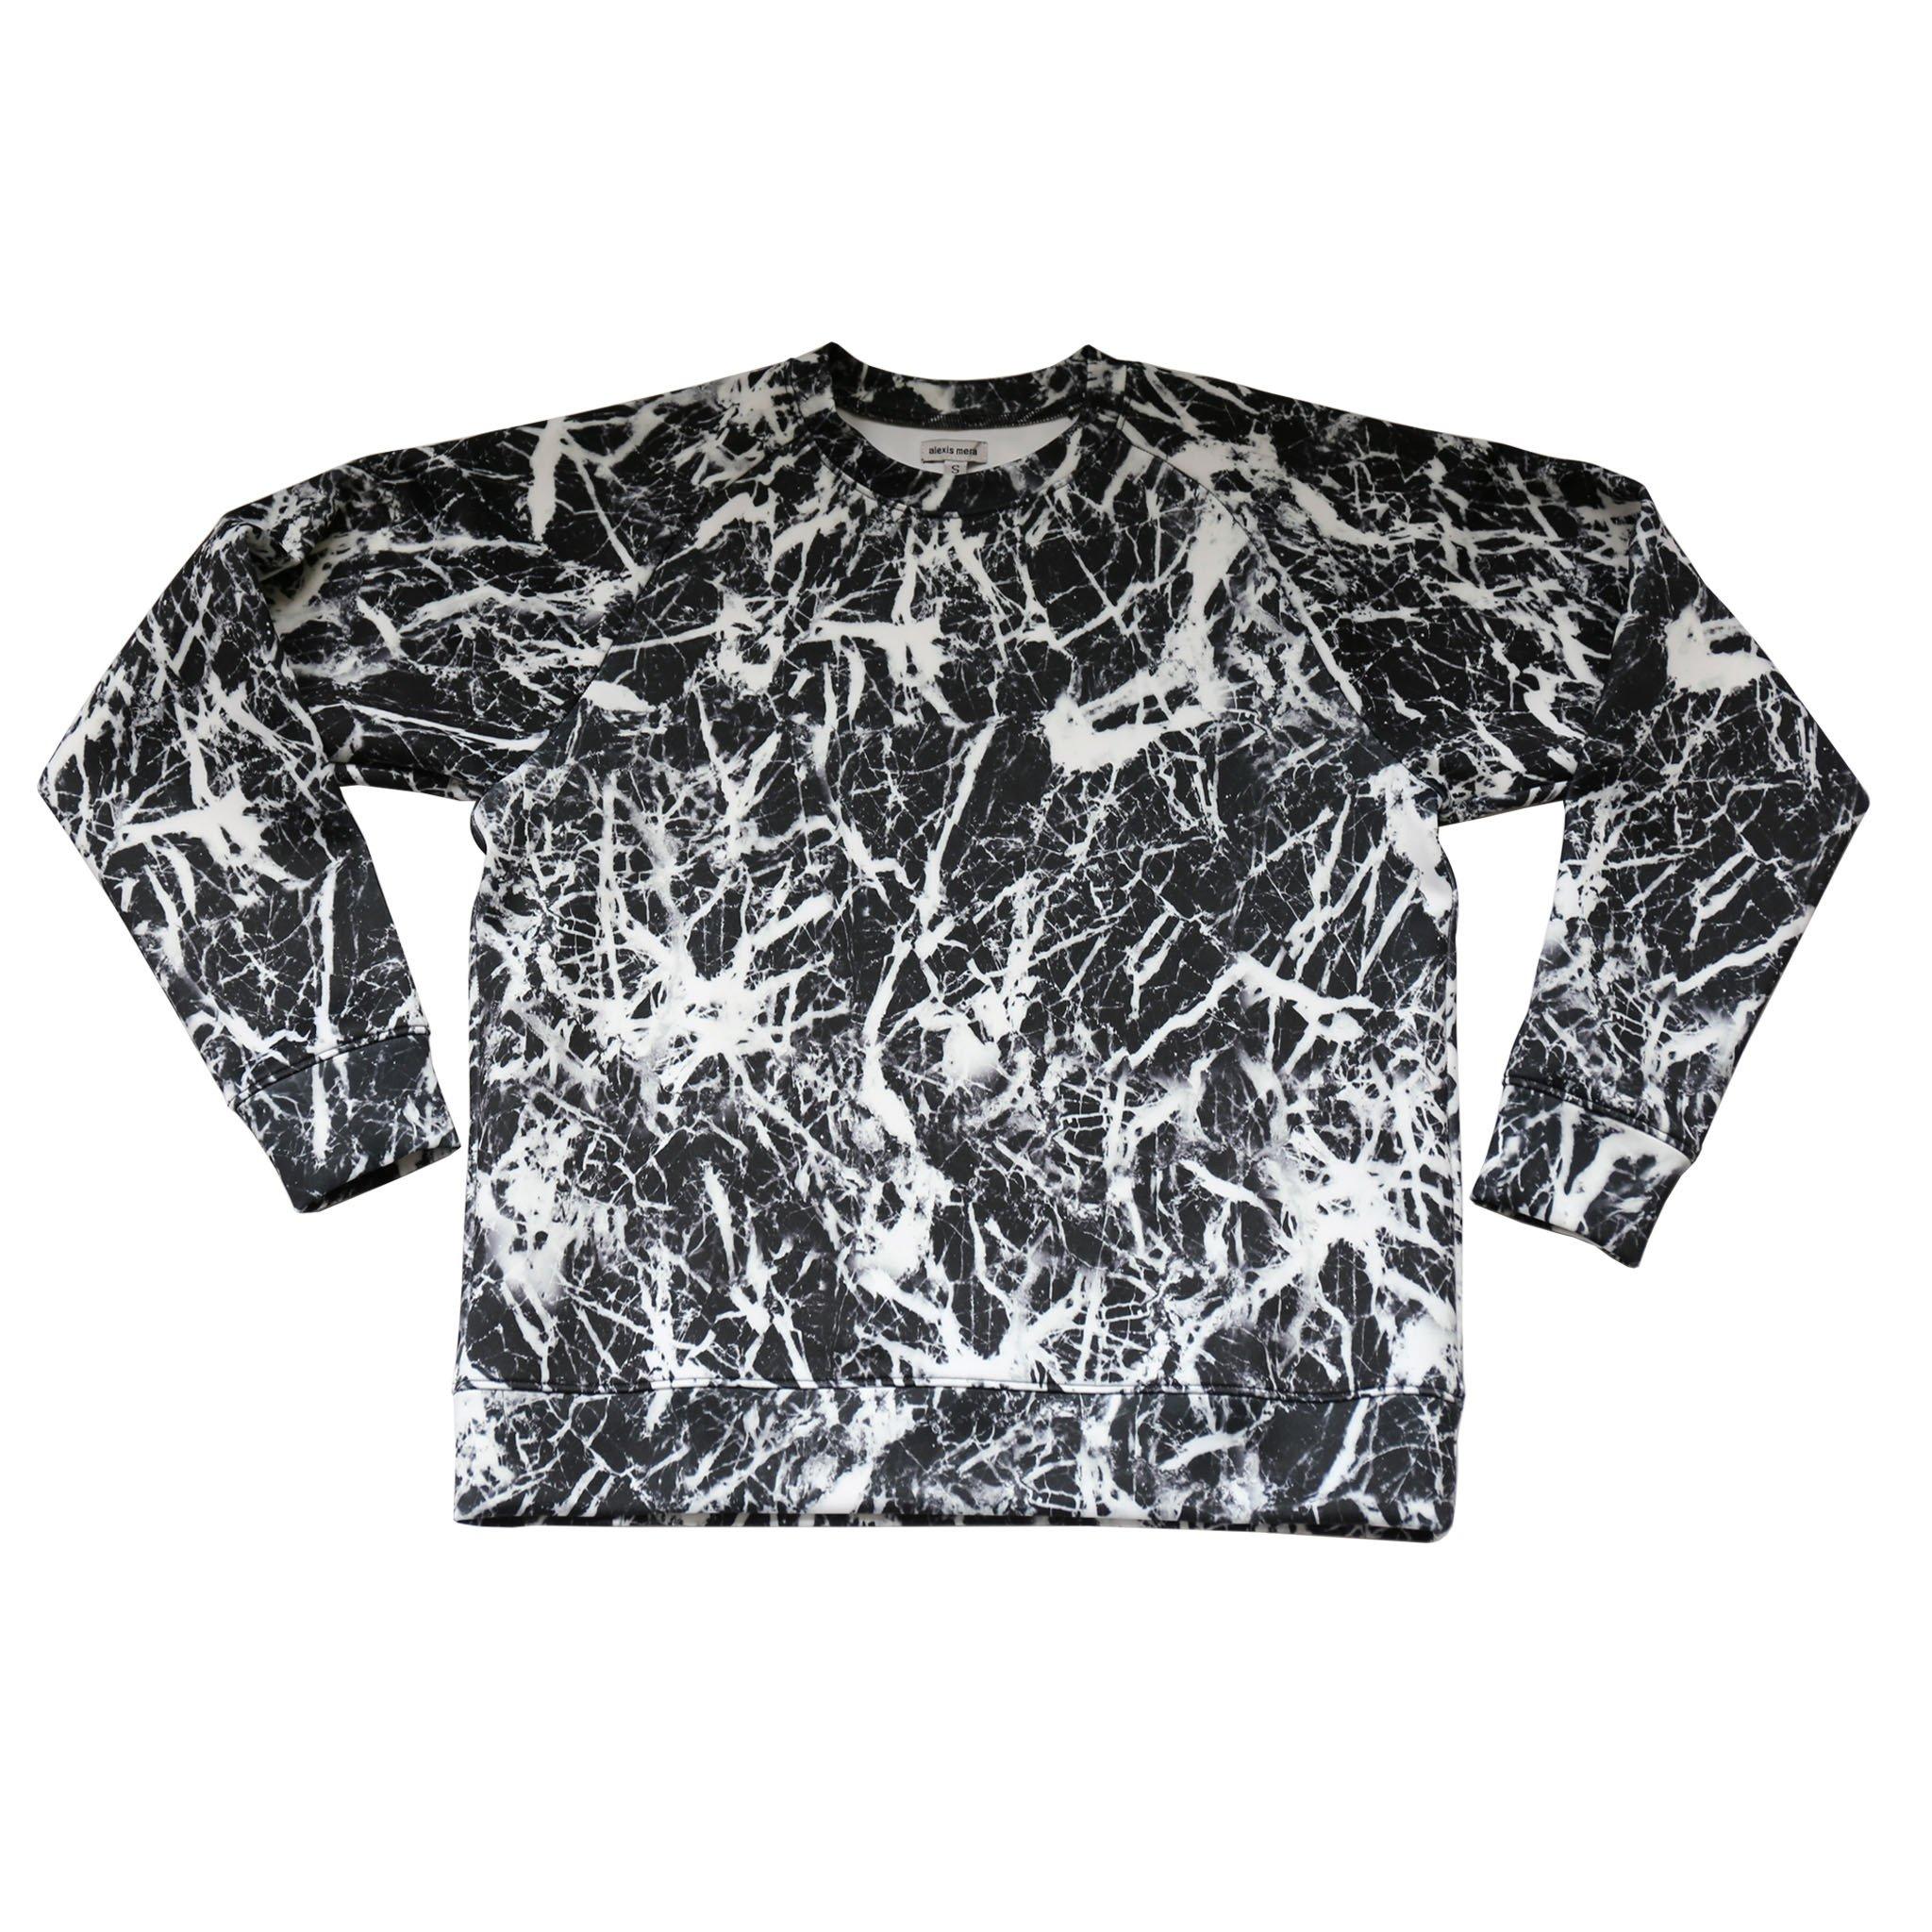 Alexis Mera Granite Sweatshirt